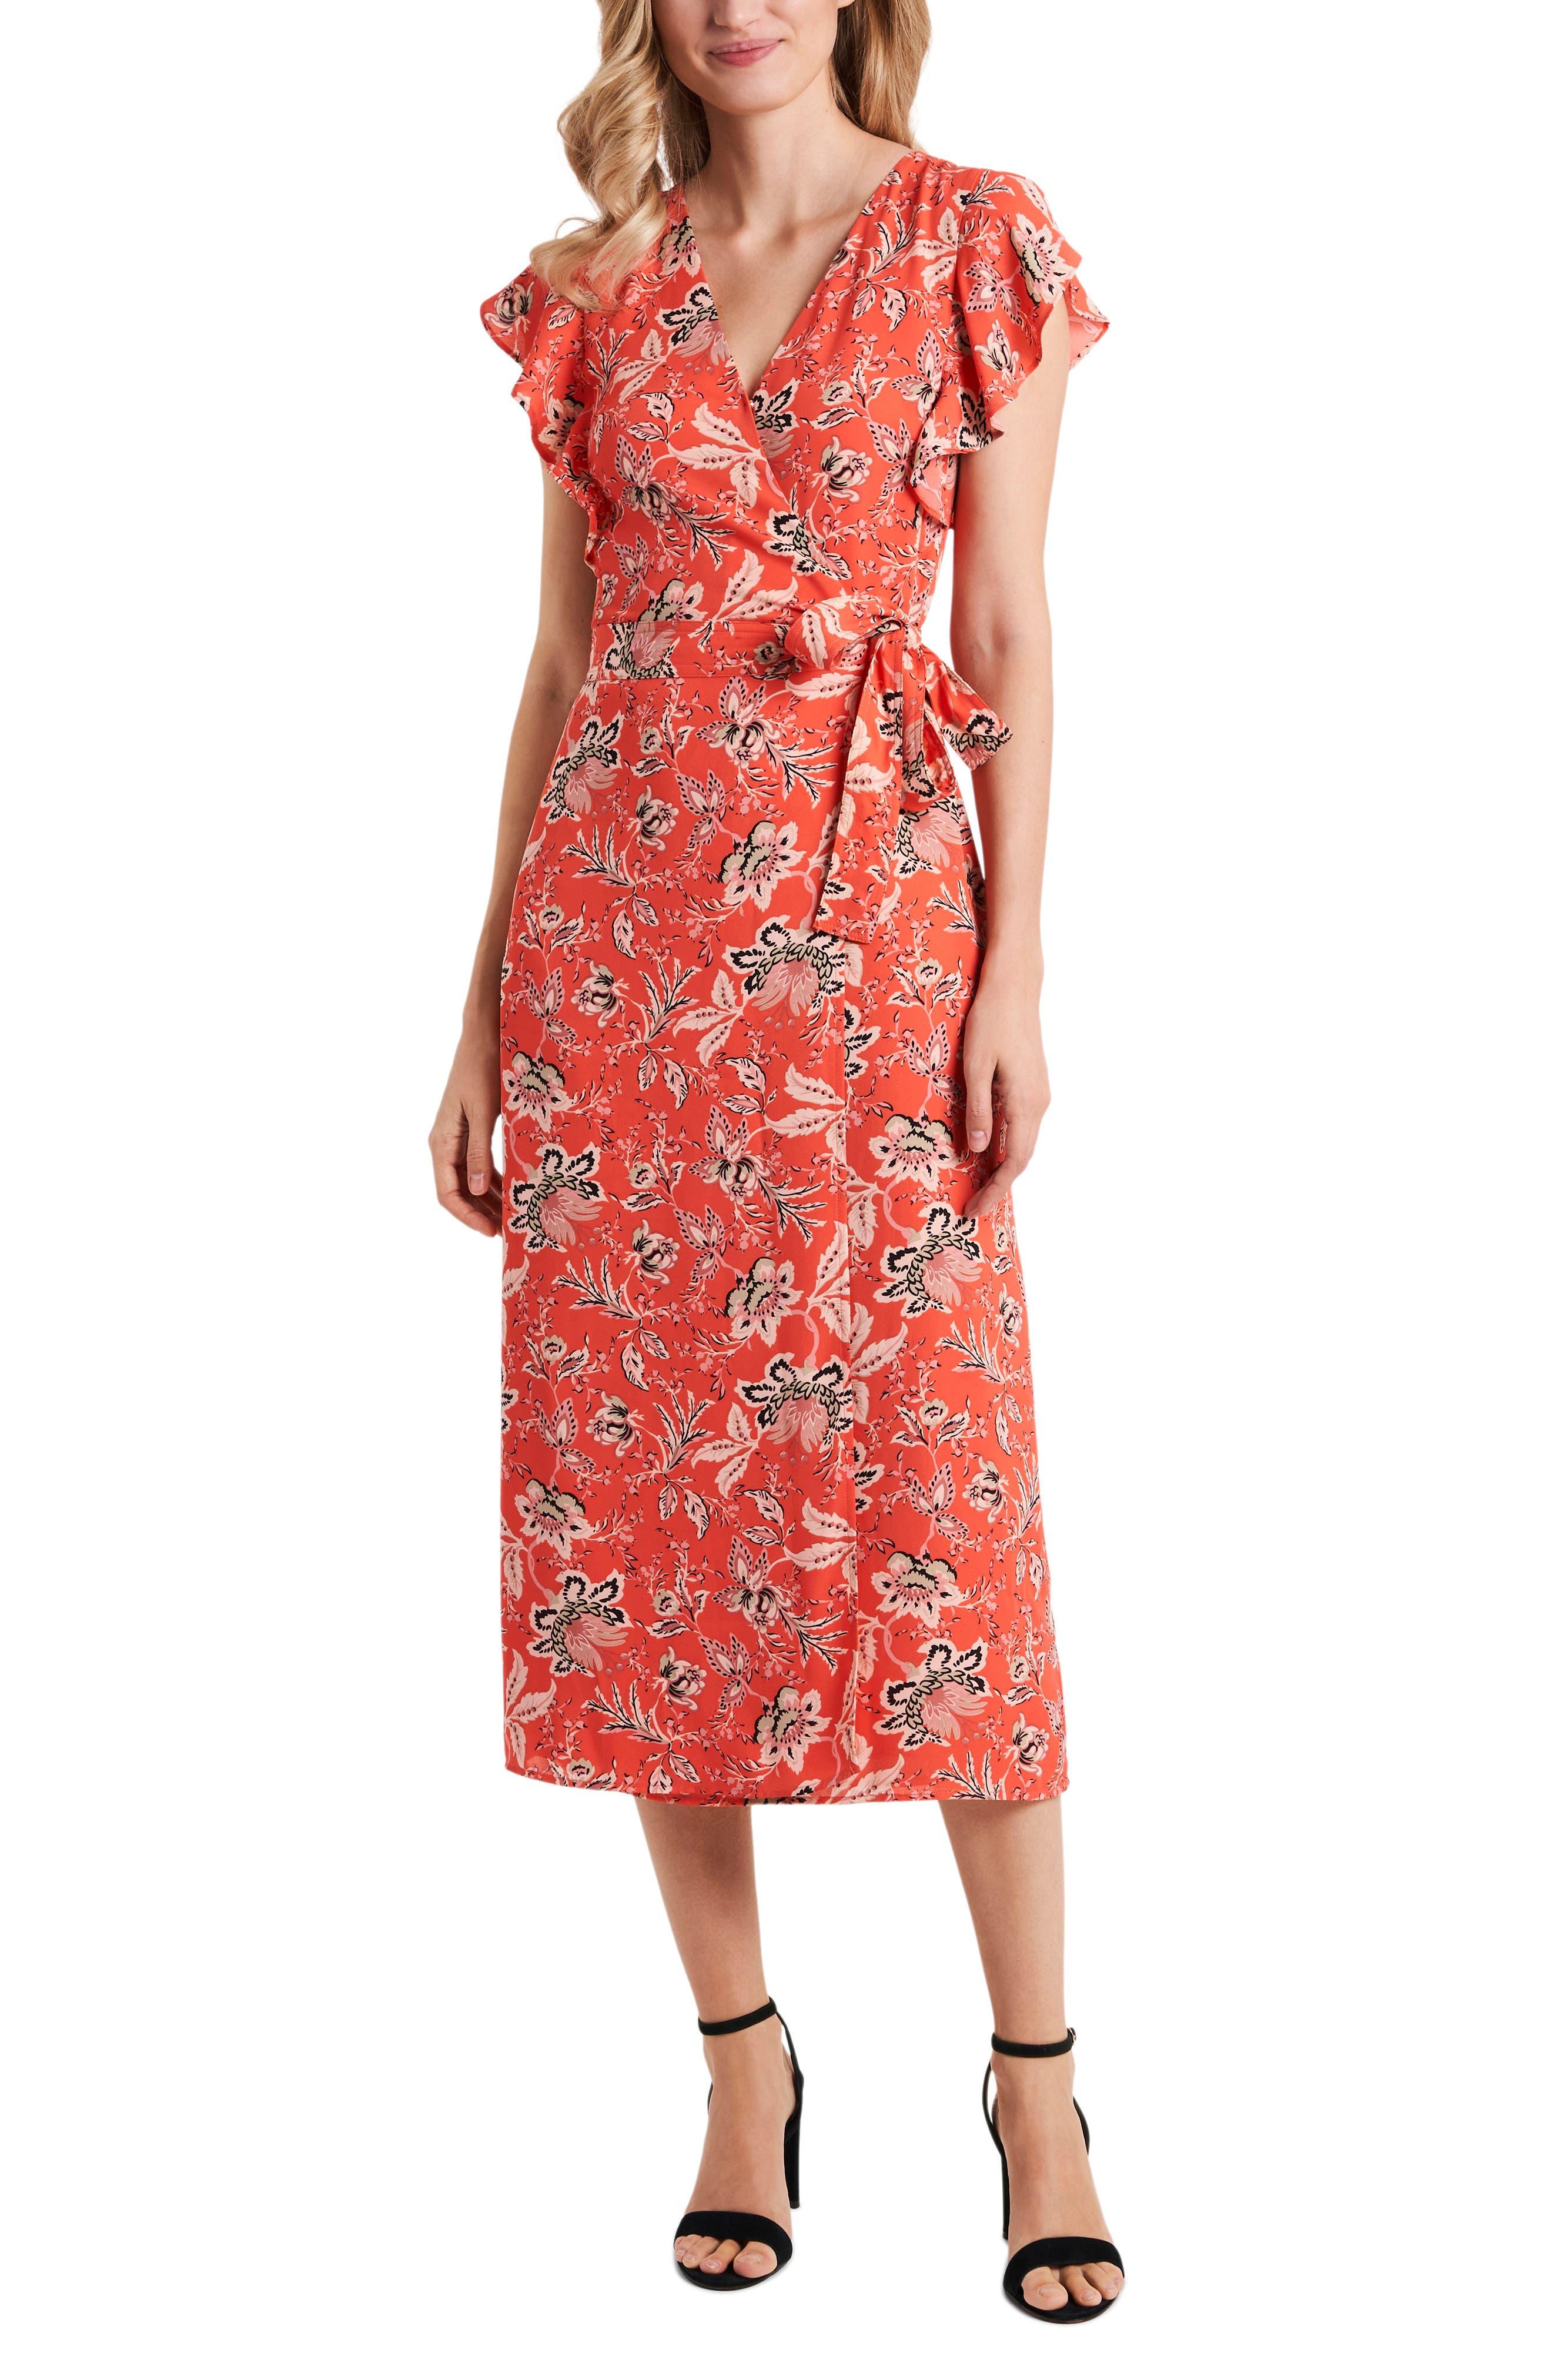 1930s Dresses | 30s Art Deco Dress Womens Vince Camuto Floral Flutter Sleeve Wrap Dress Size 16 - Coral $119.00 AT vintagedancer.com